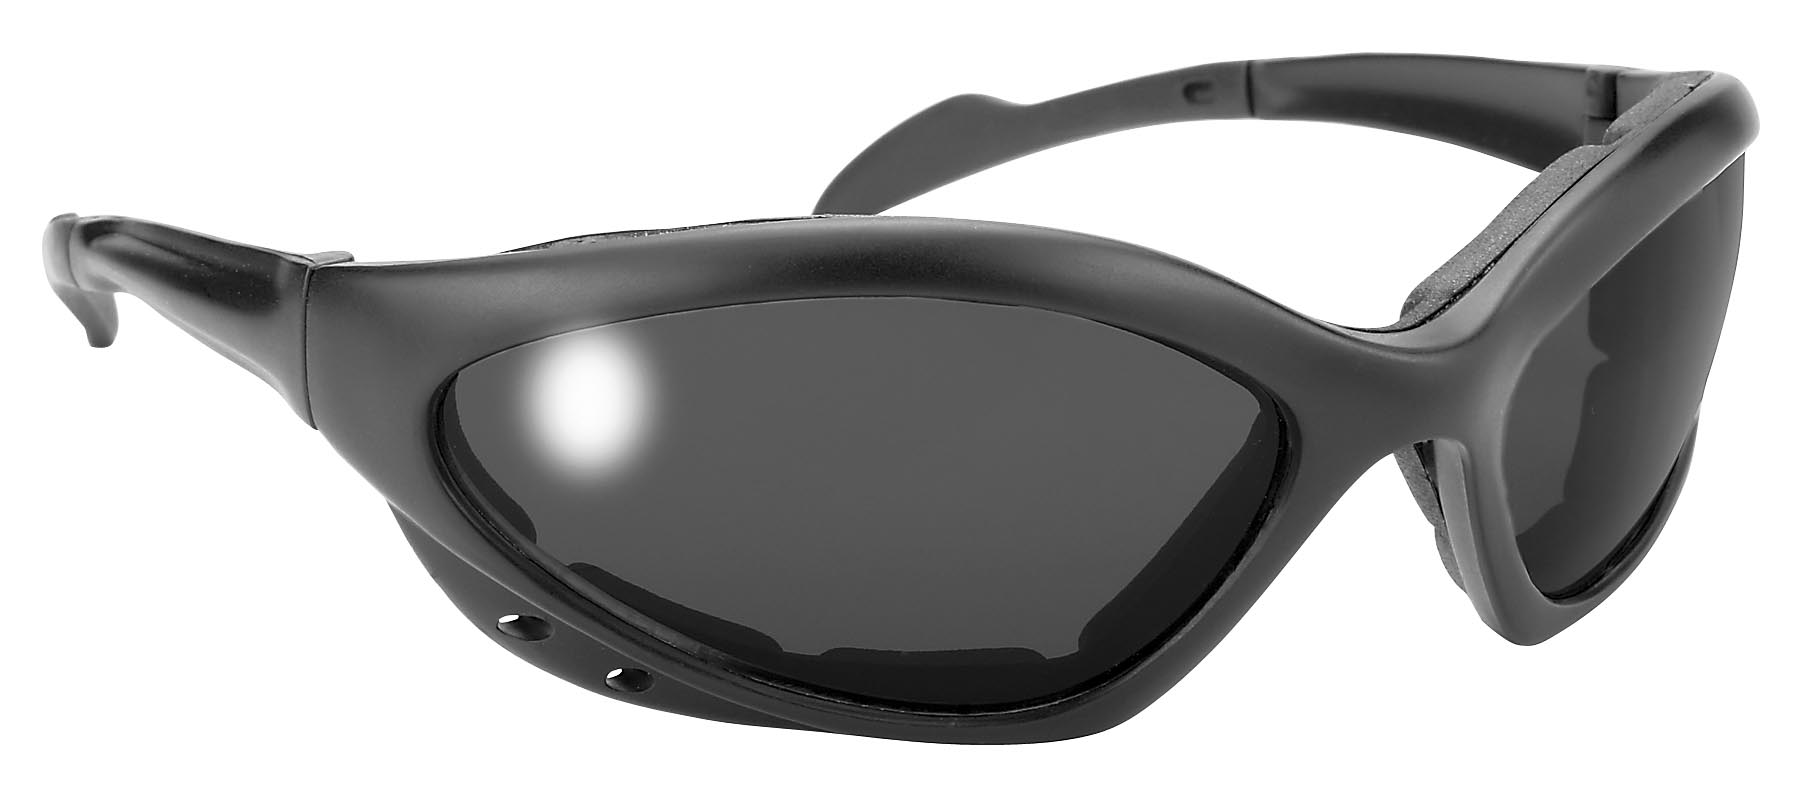 Navigator Padded Sunglasses